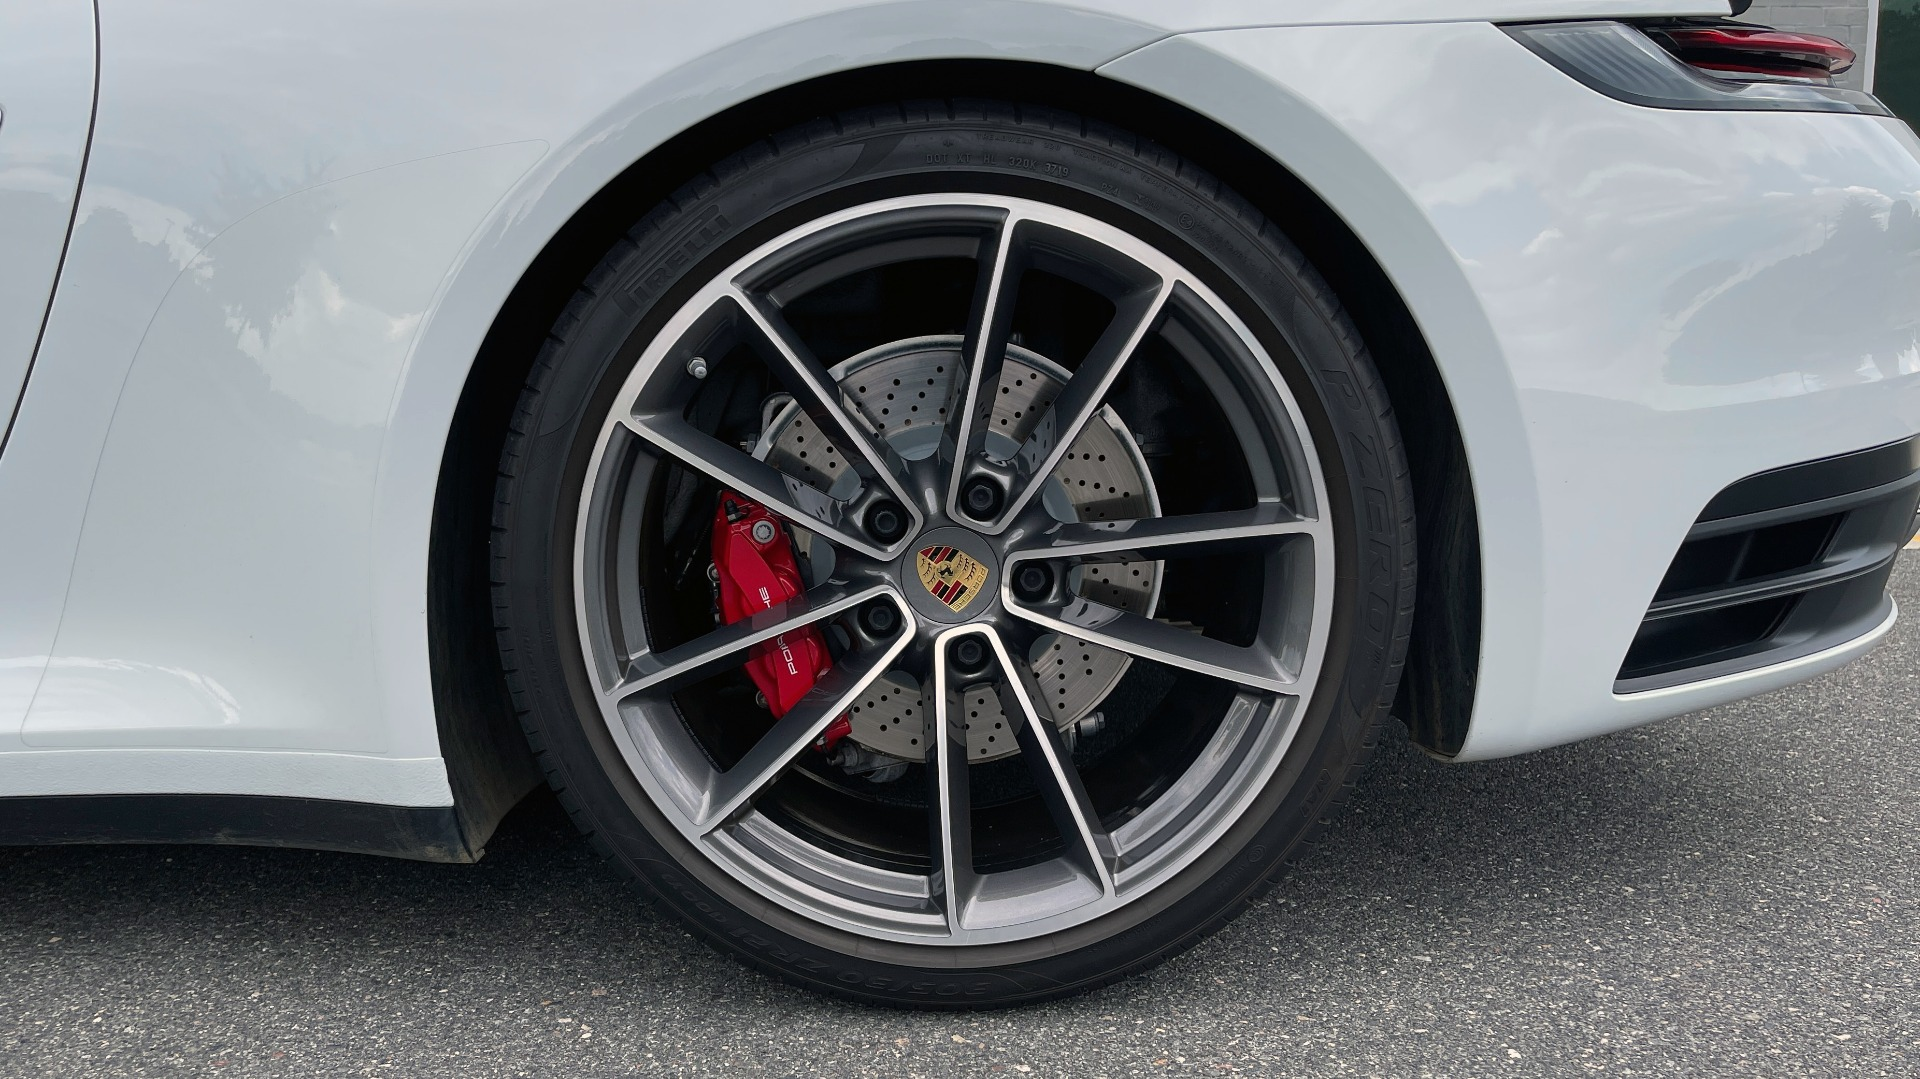 Used 2020 Porsche 911 CARRERA 4S CABRIOLET PREMIUM SPORT PKG / NAV / BOSE / LIGHT DESIGN PKG for sale $167,595 at Formula Imports in Charlotte NC 28227 81